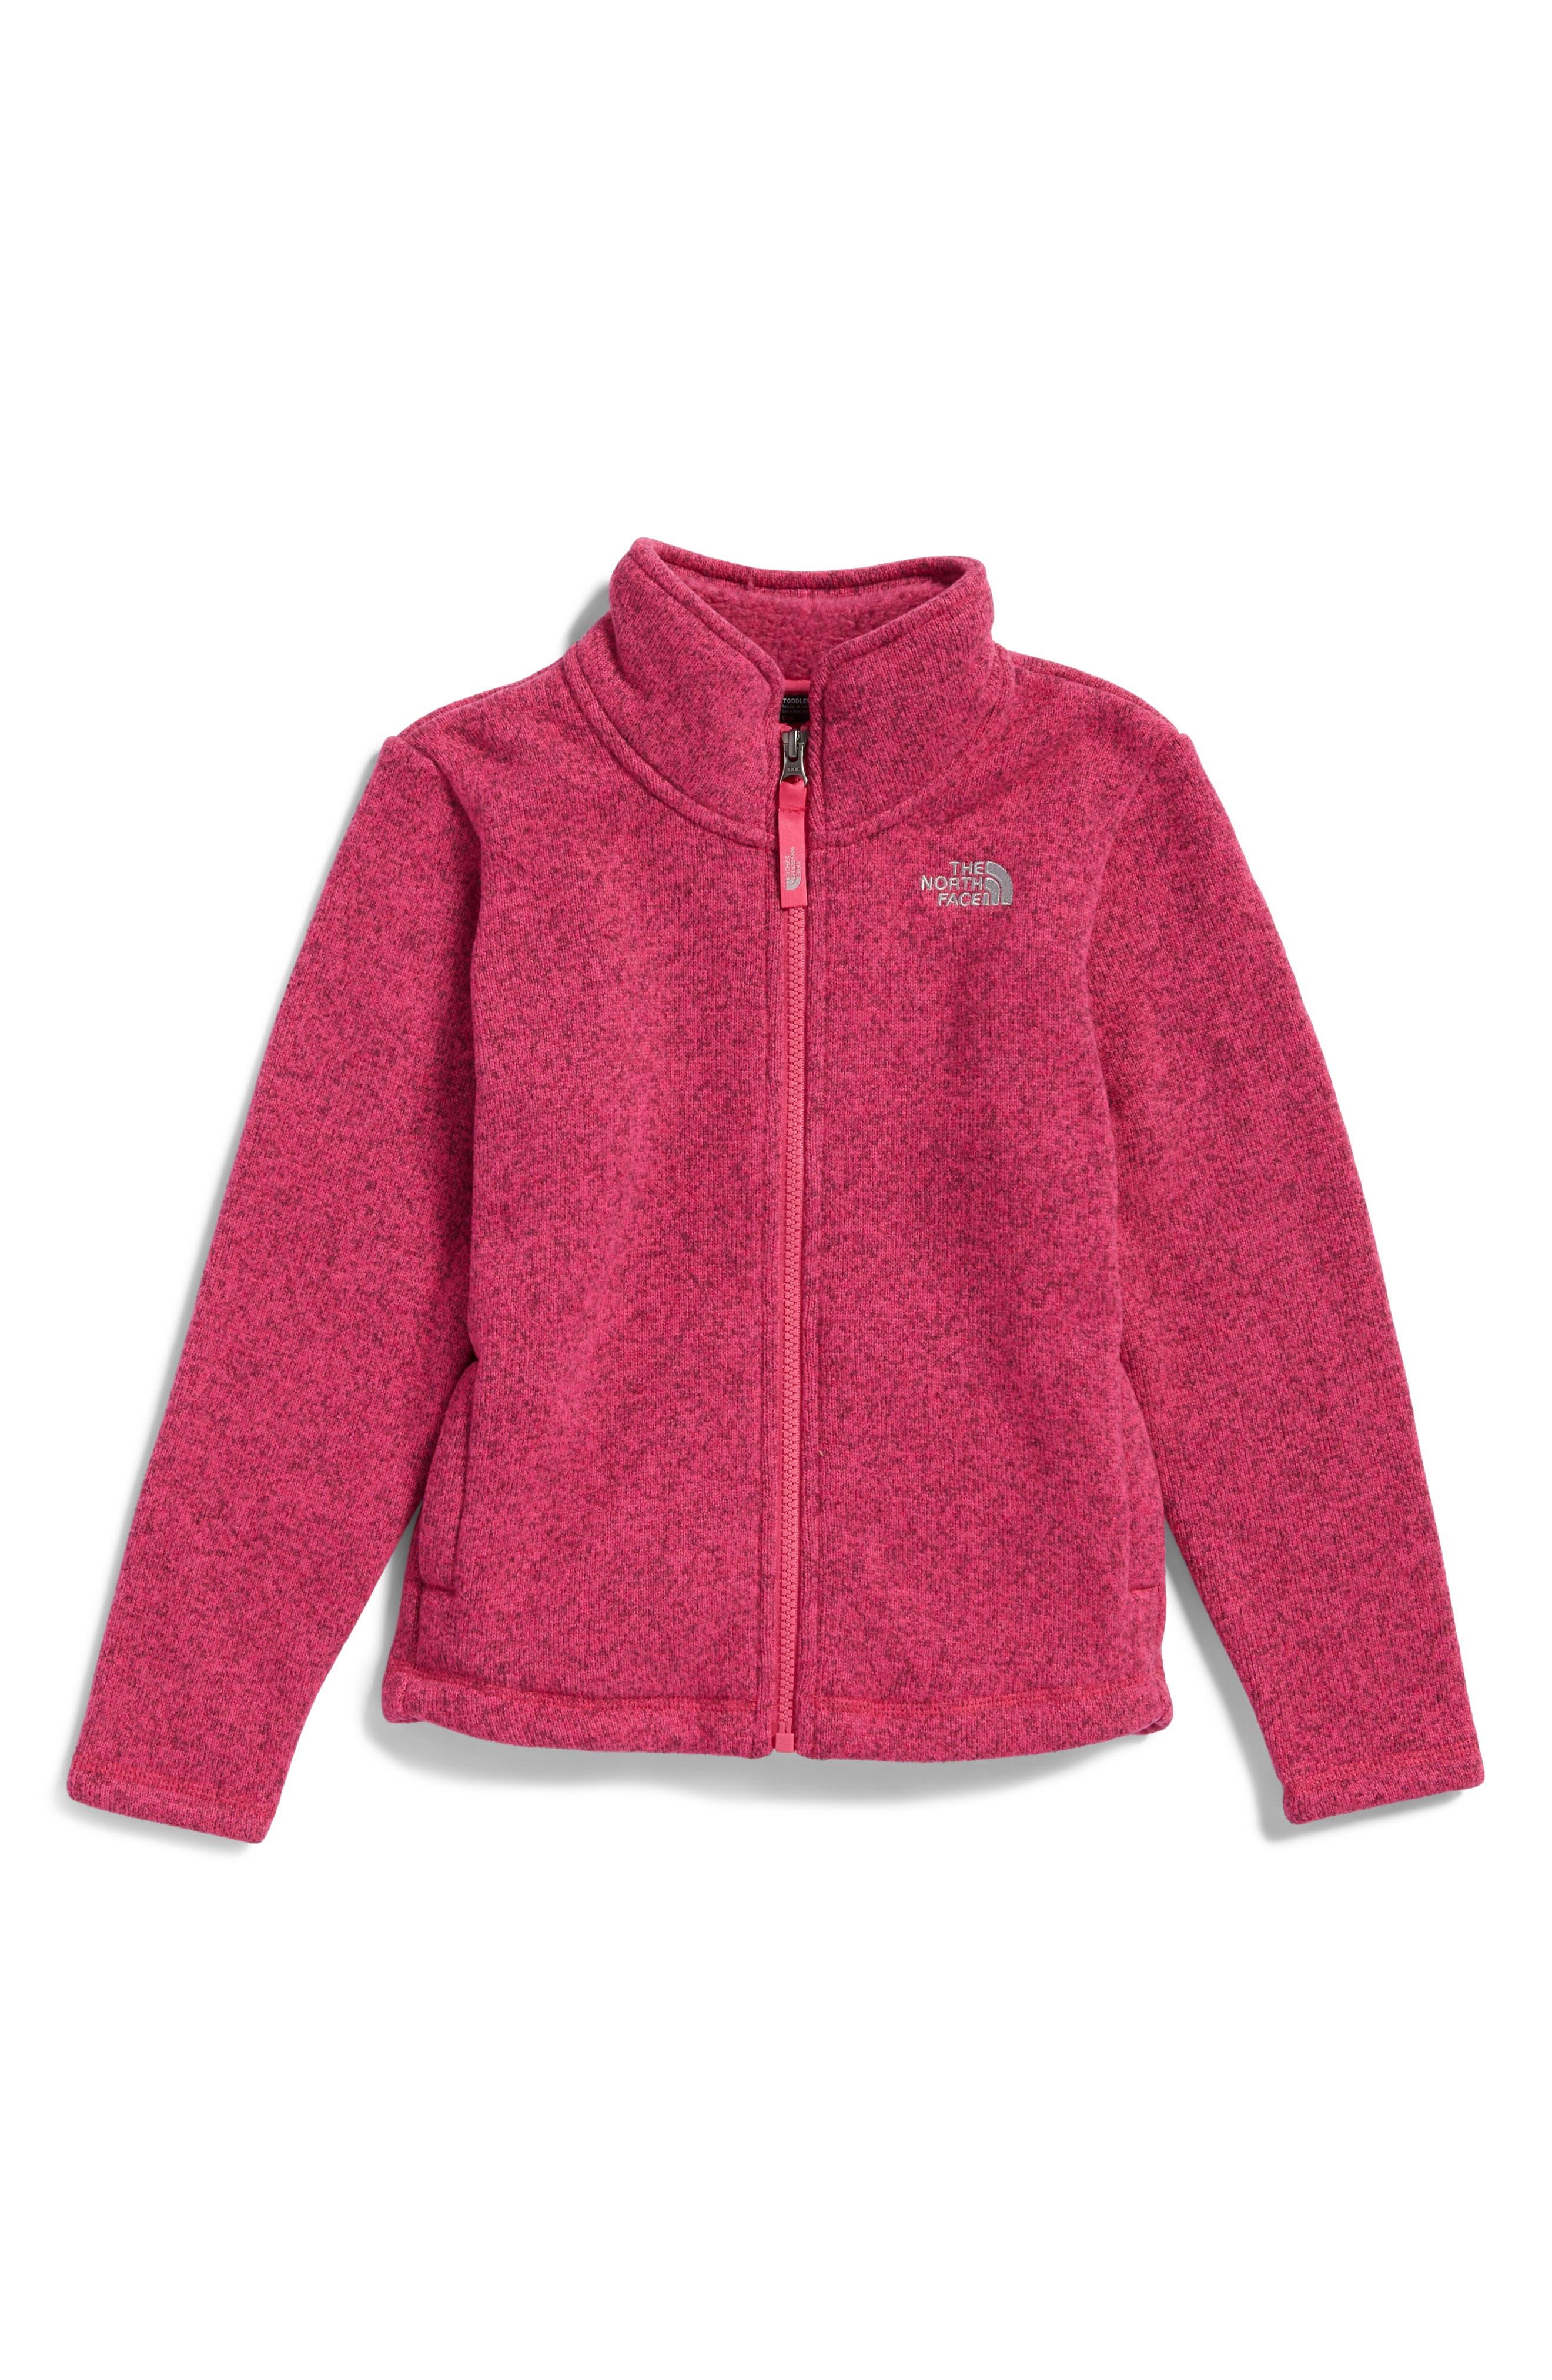 Main Image - The North Face Crescent Fleece Jacket (Toddler Girls & Little Girls)